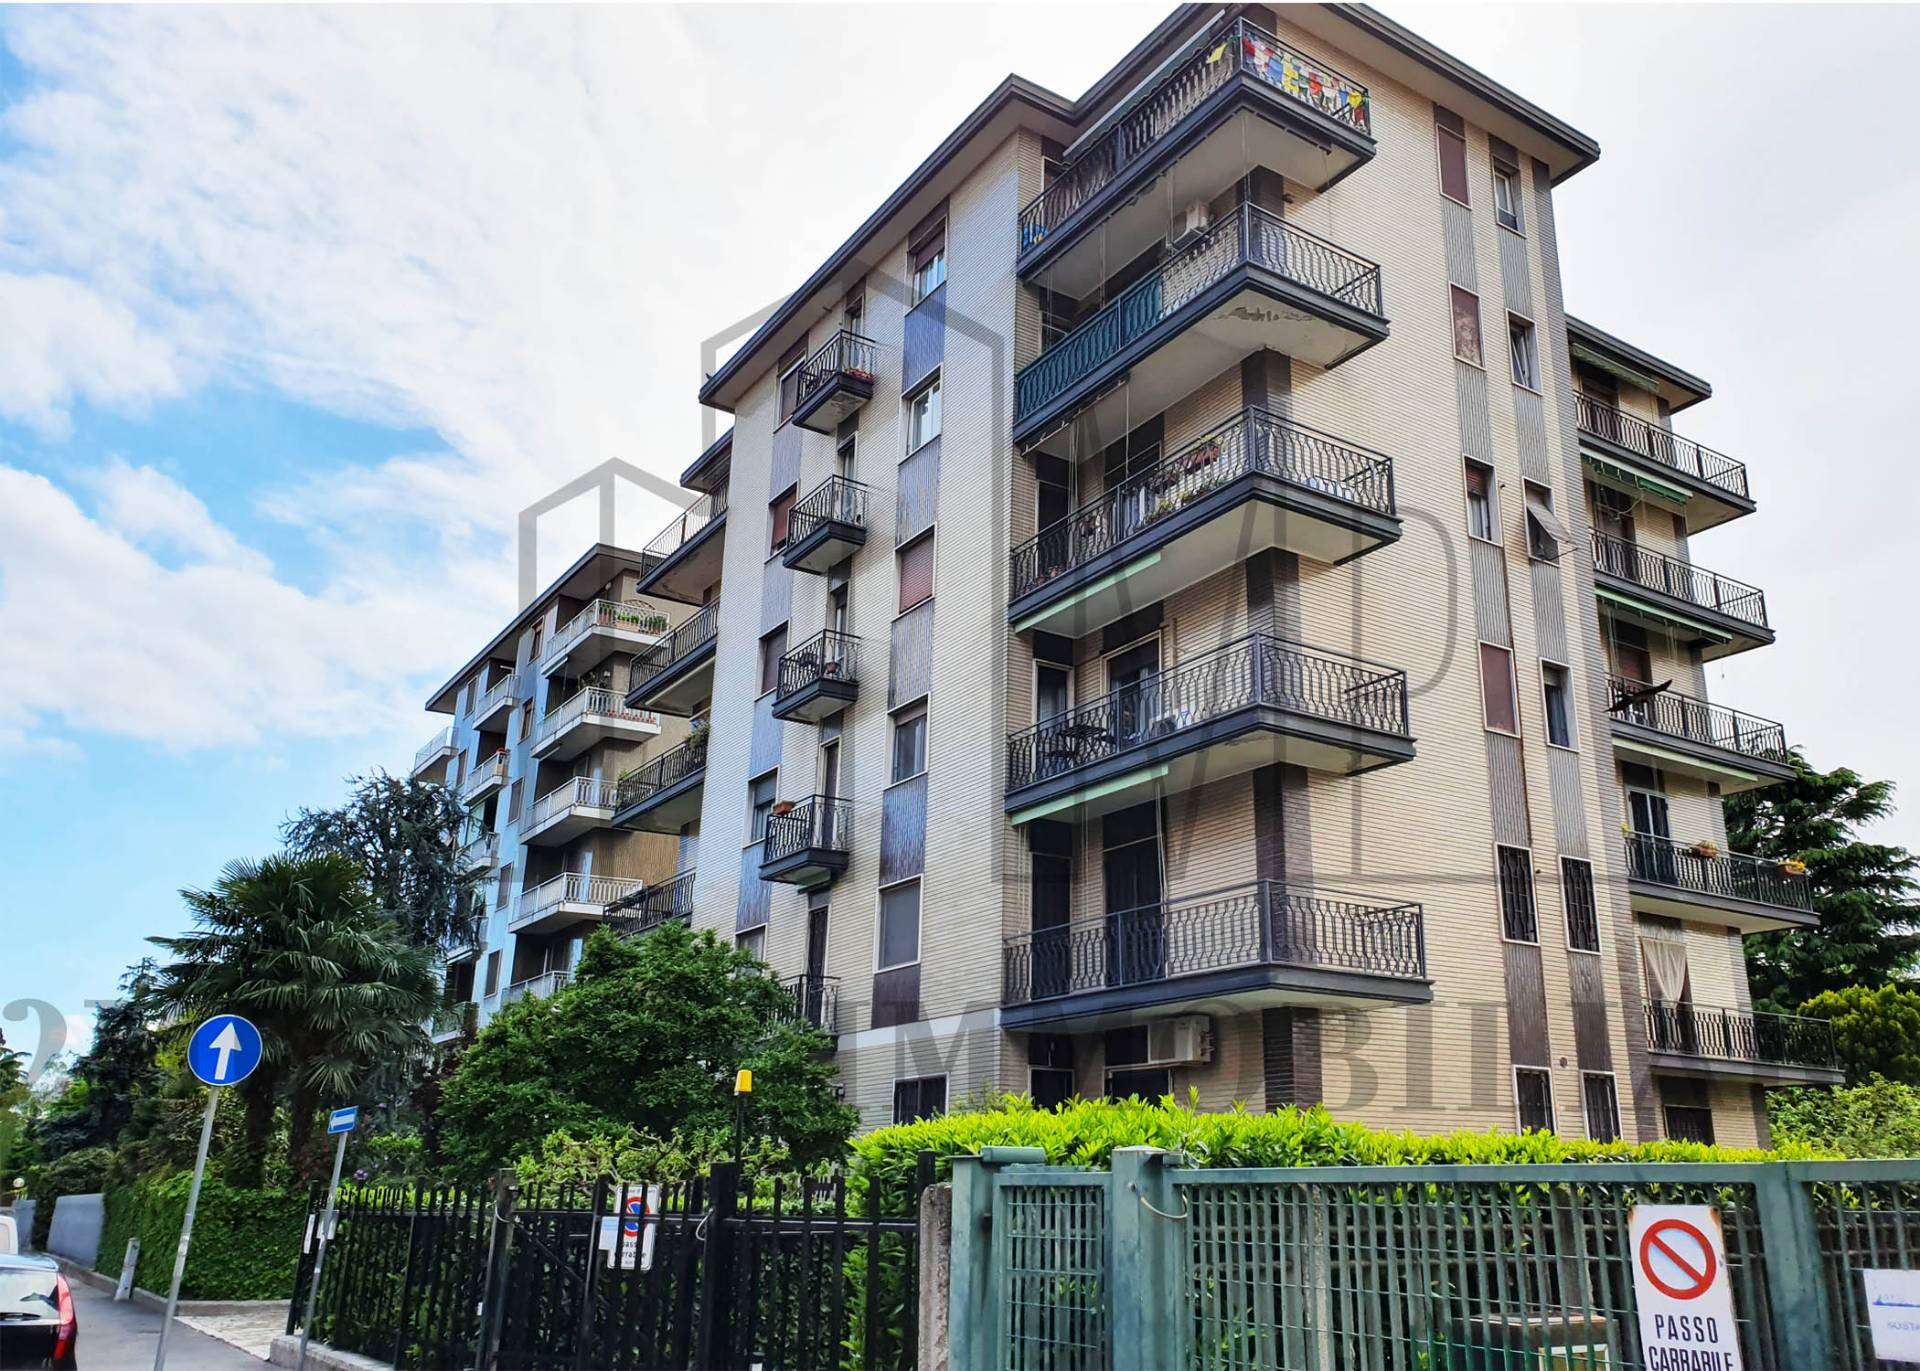 Vendite E Affitti Di Appartamenti Trilocali Casaspecialeit